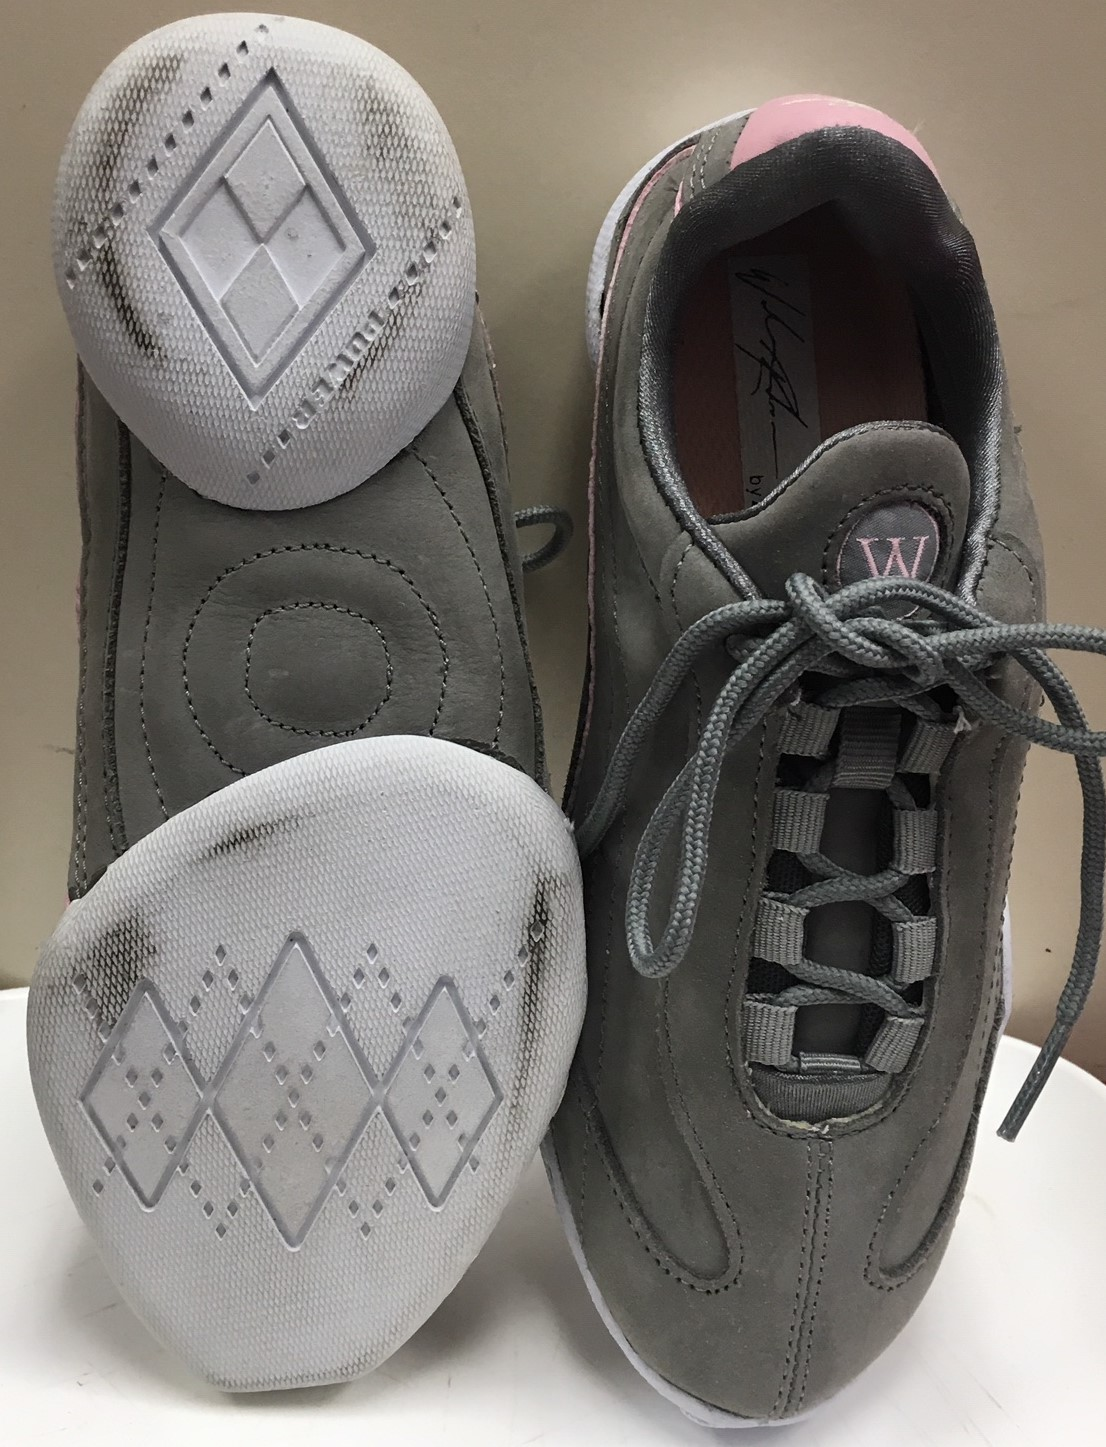 Wade Robson Wajero Signature Flexible Dance Sneaker Grey Pink